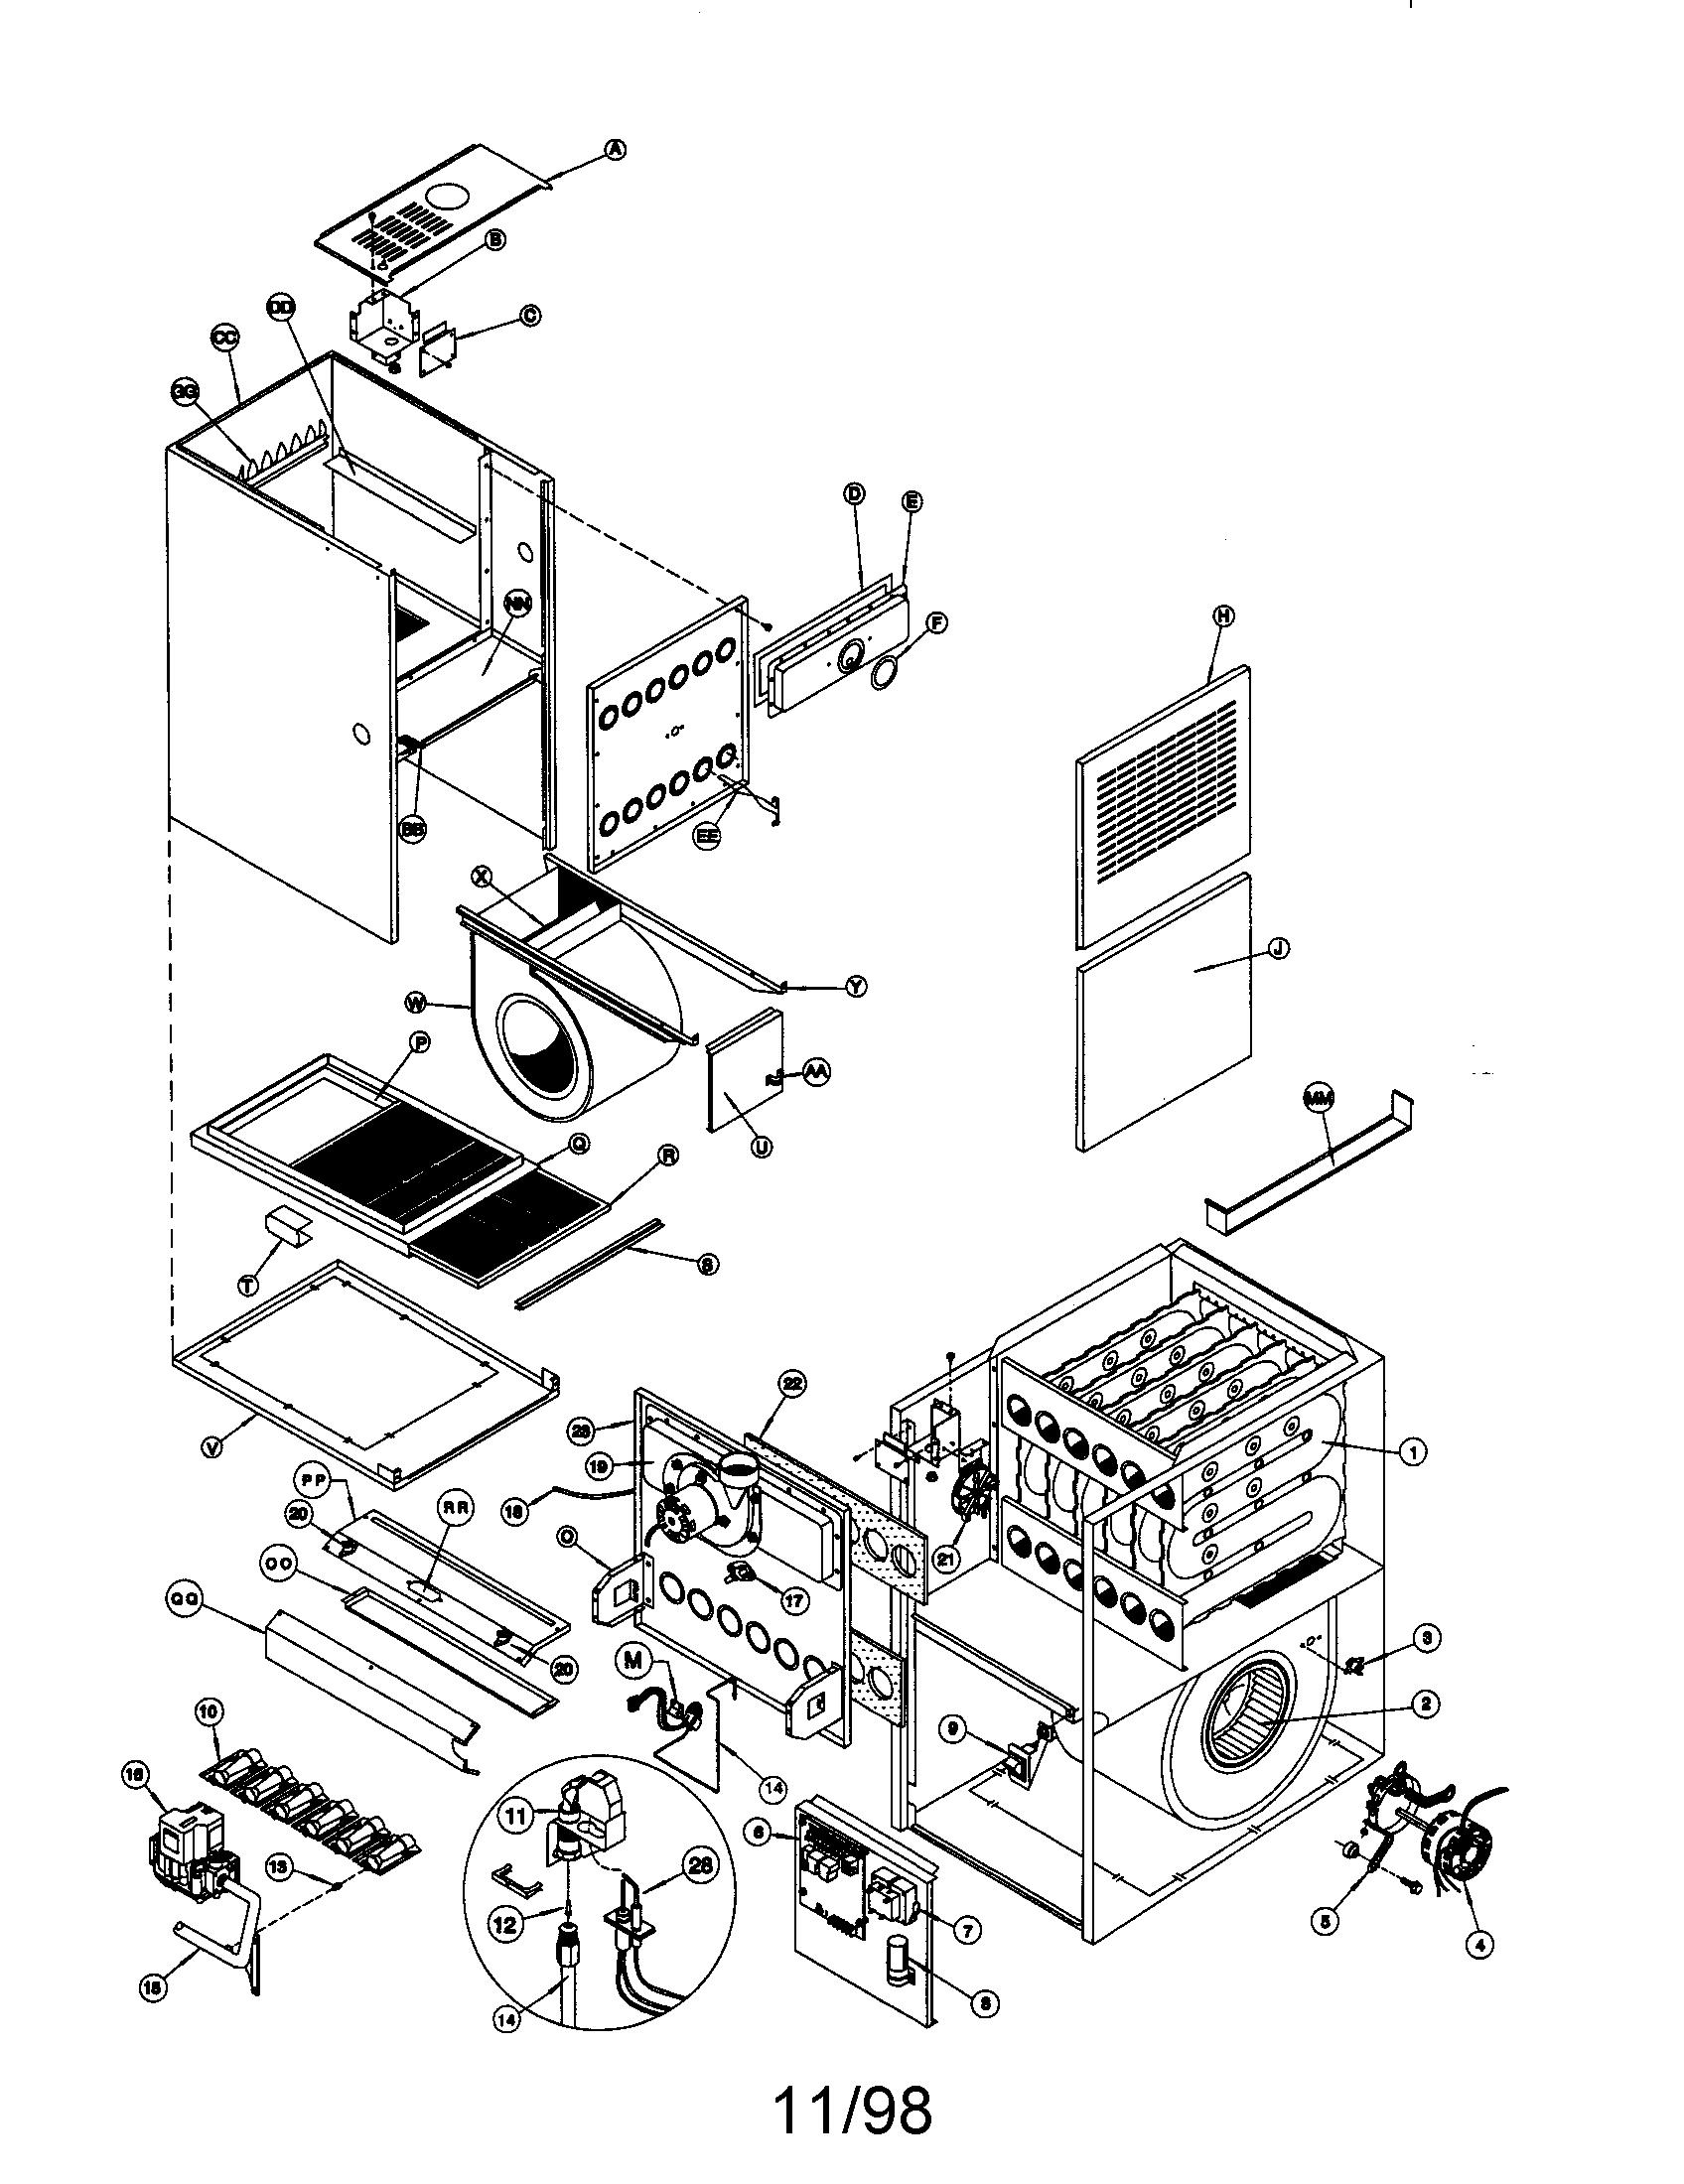 tempstar wiring diagram furnace raspberry pi 2 icp gas parts model ntc6125kja1 sears partsdirect